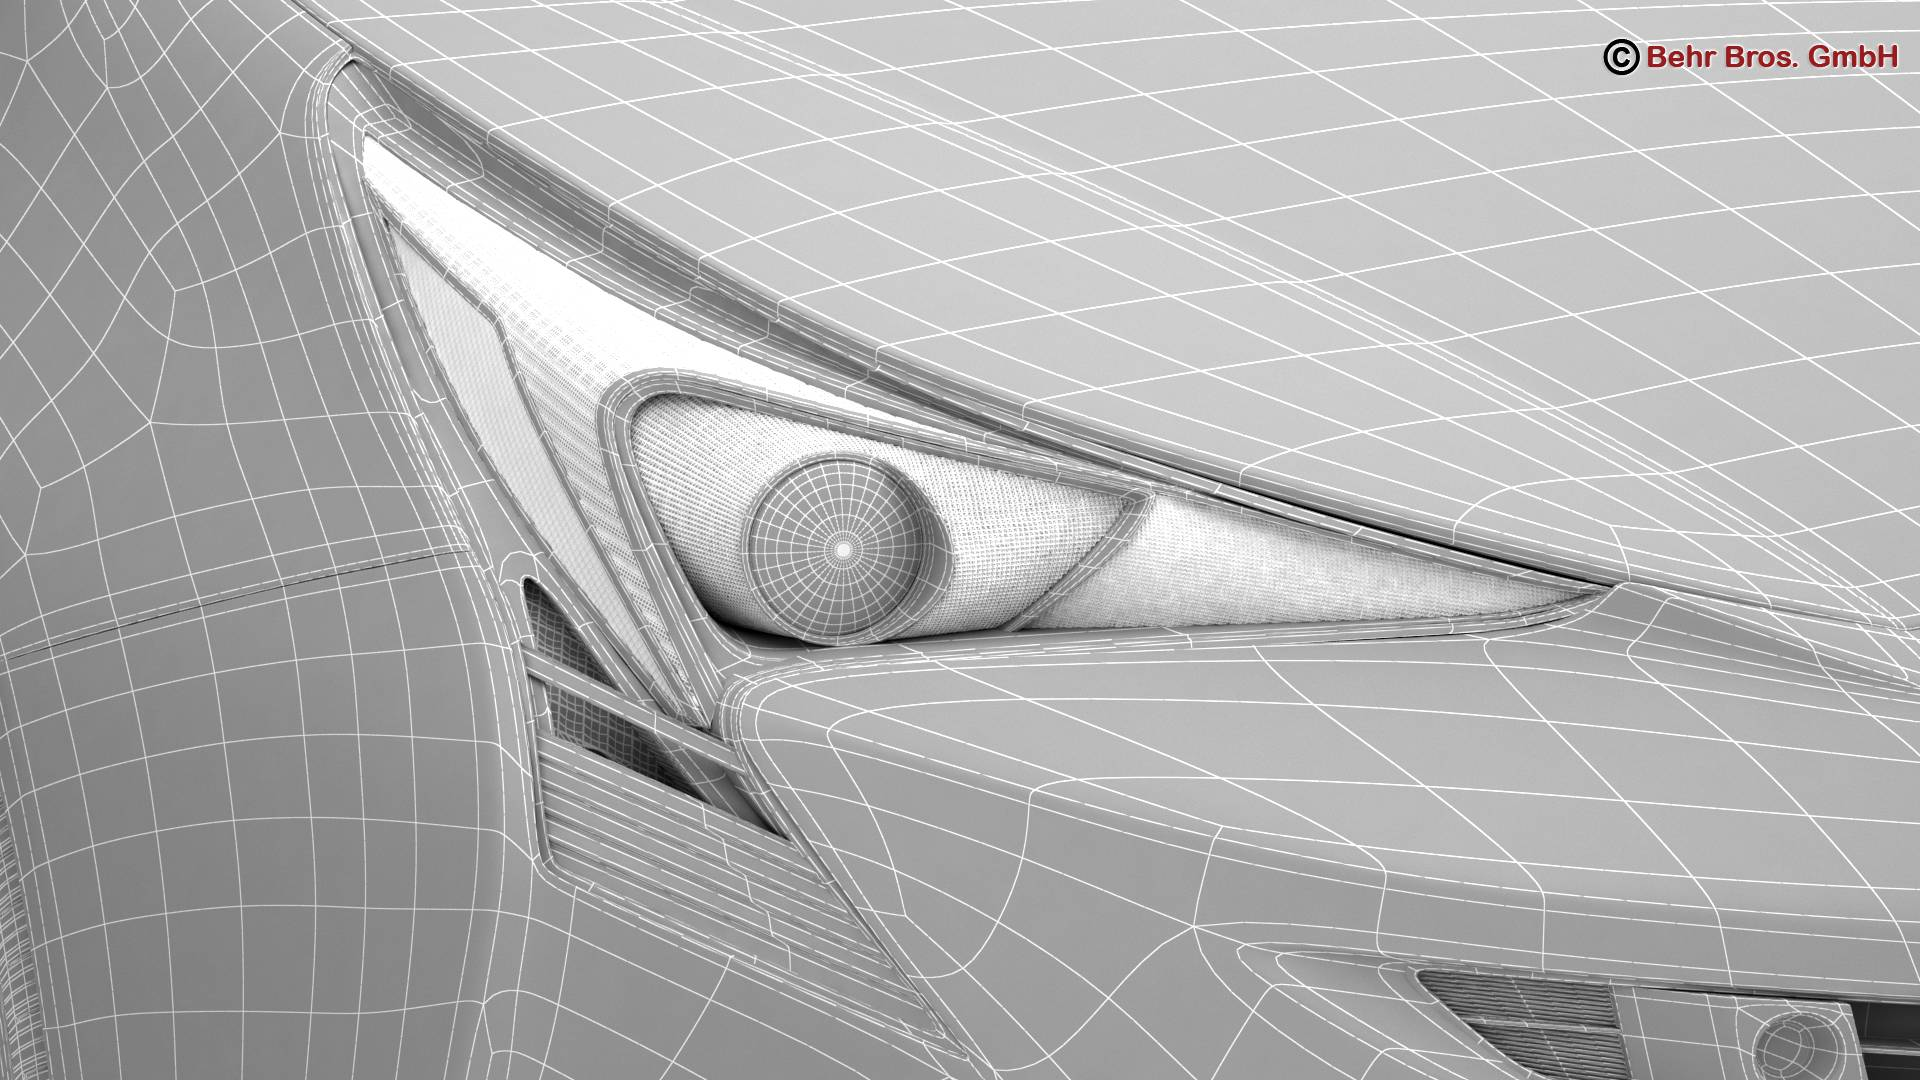 toyota prius 2016 v1 3d model 3ds max fbx c4d lwo ma mb obj 220485